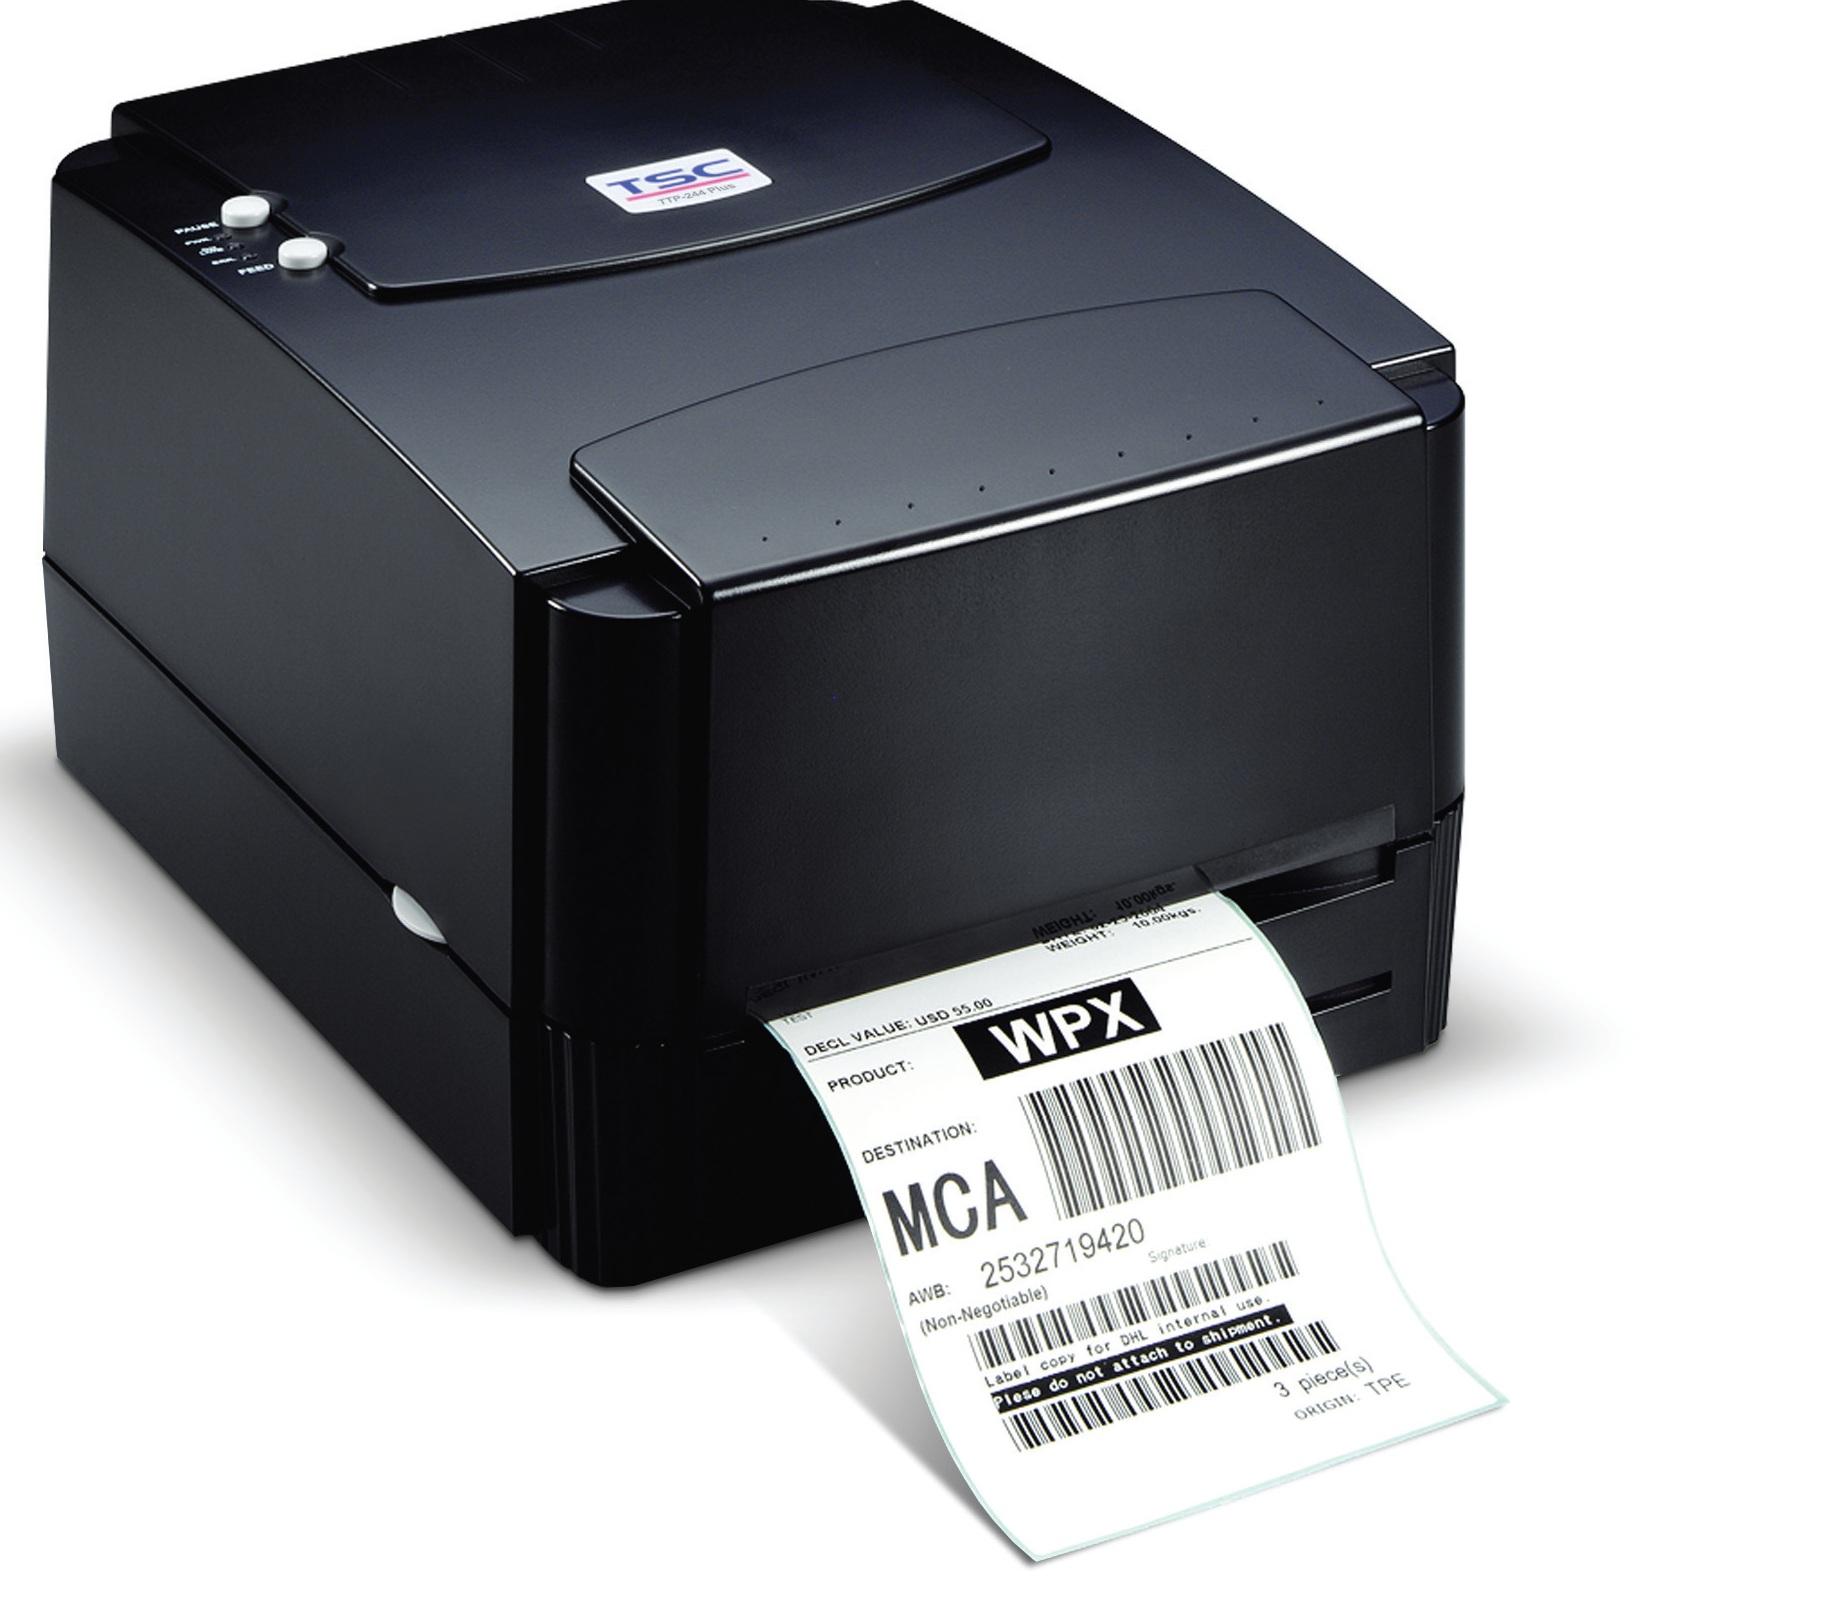 Impresora Ttp244 Id Group S A